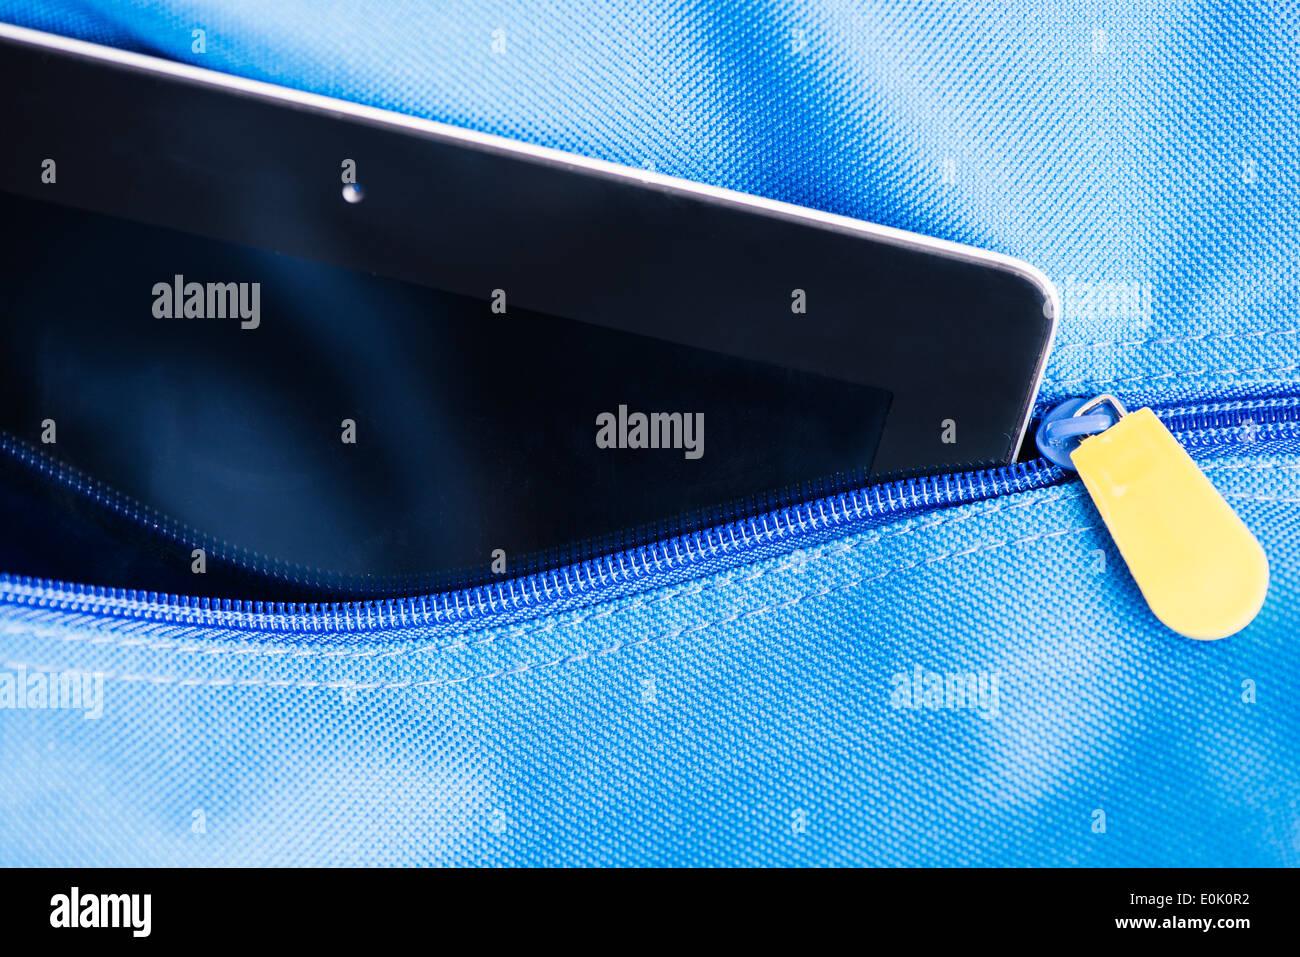 Digital tablet computer in blue school bag - Stock Image